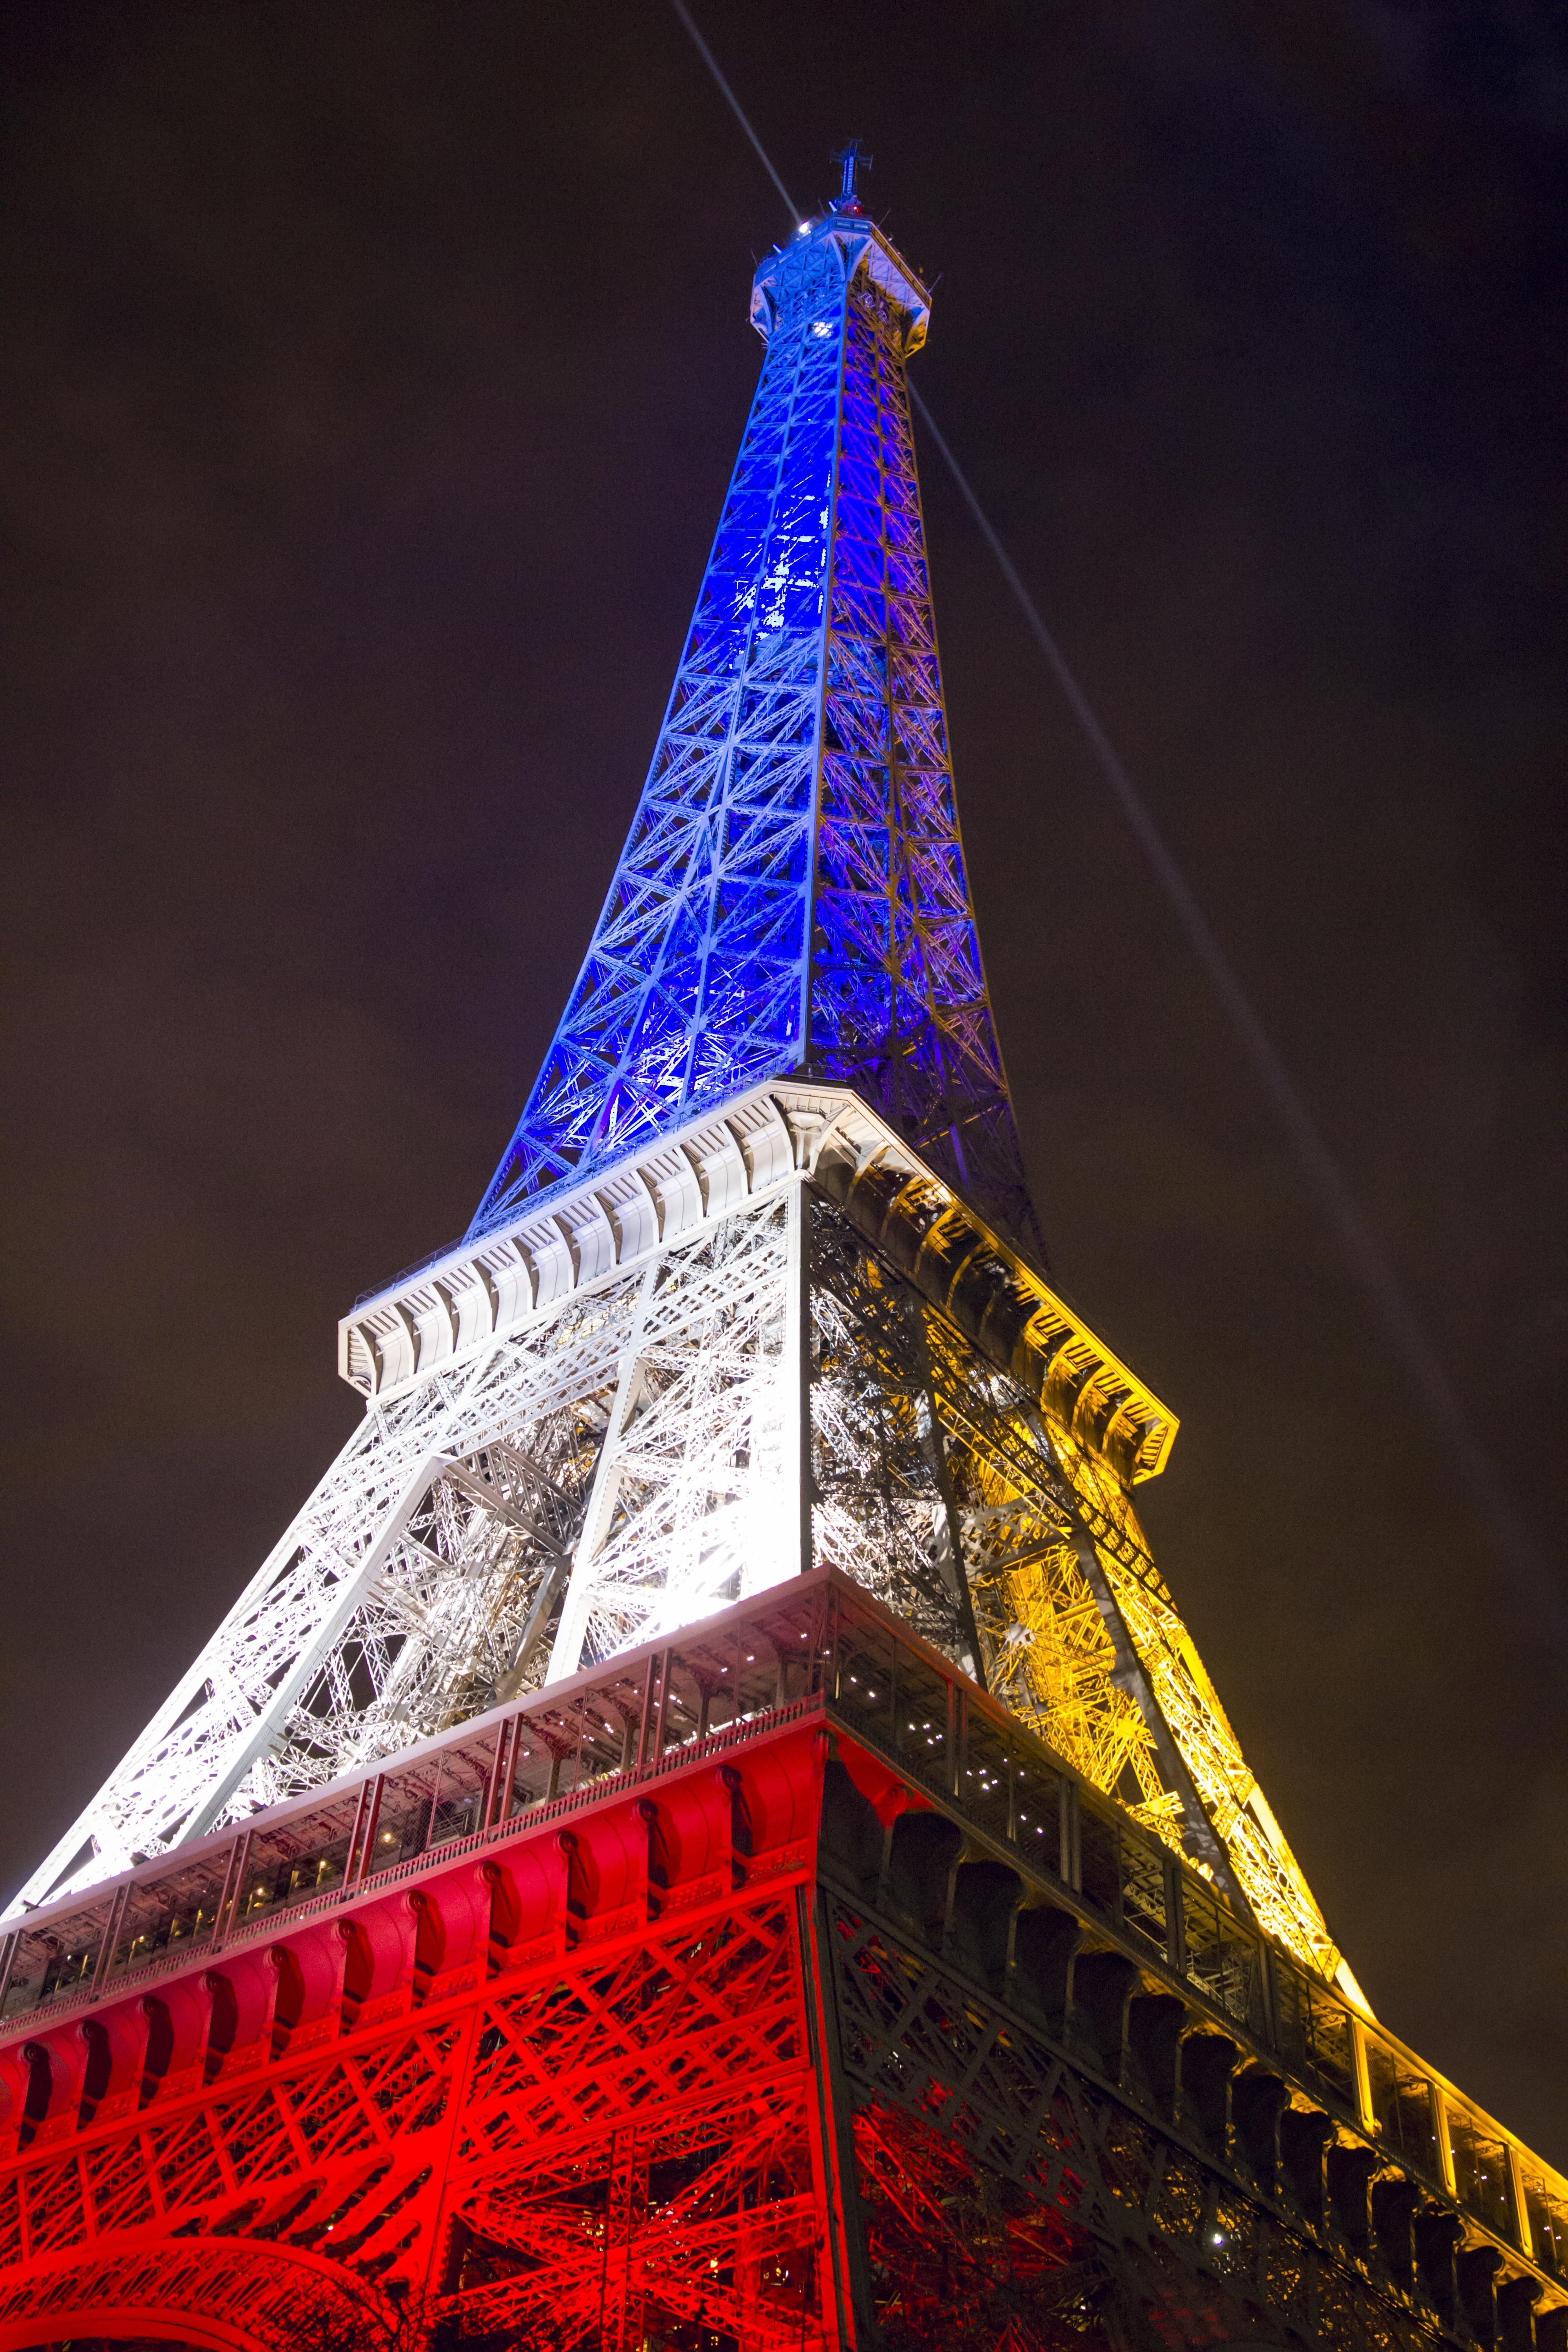 night eiffel tower paris france europe tower flag landmark tourism christmas decoration eiffel french european famous